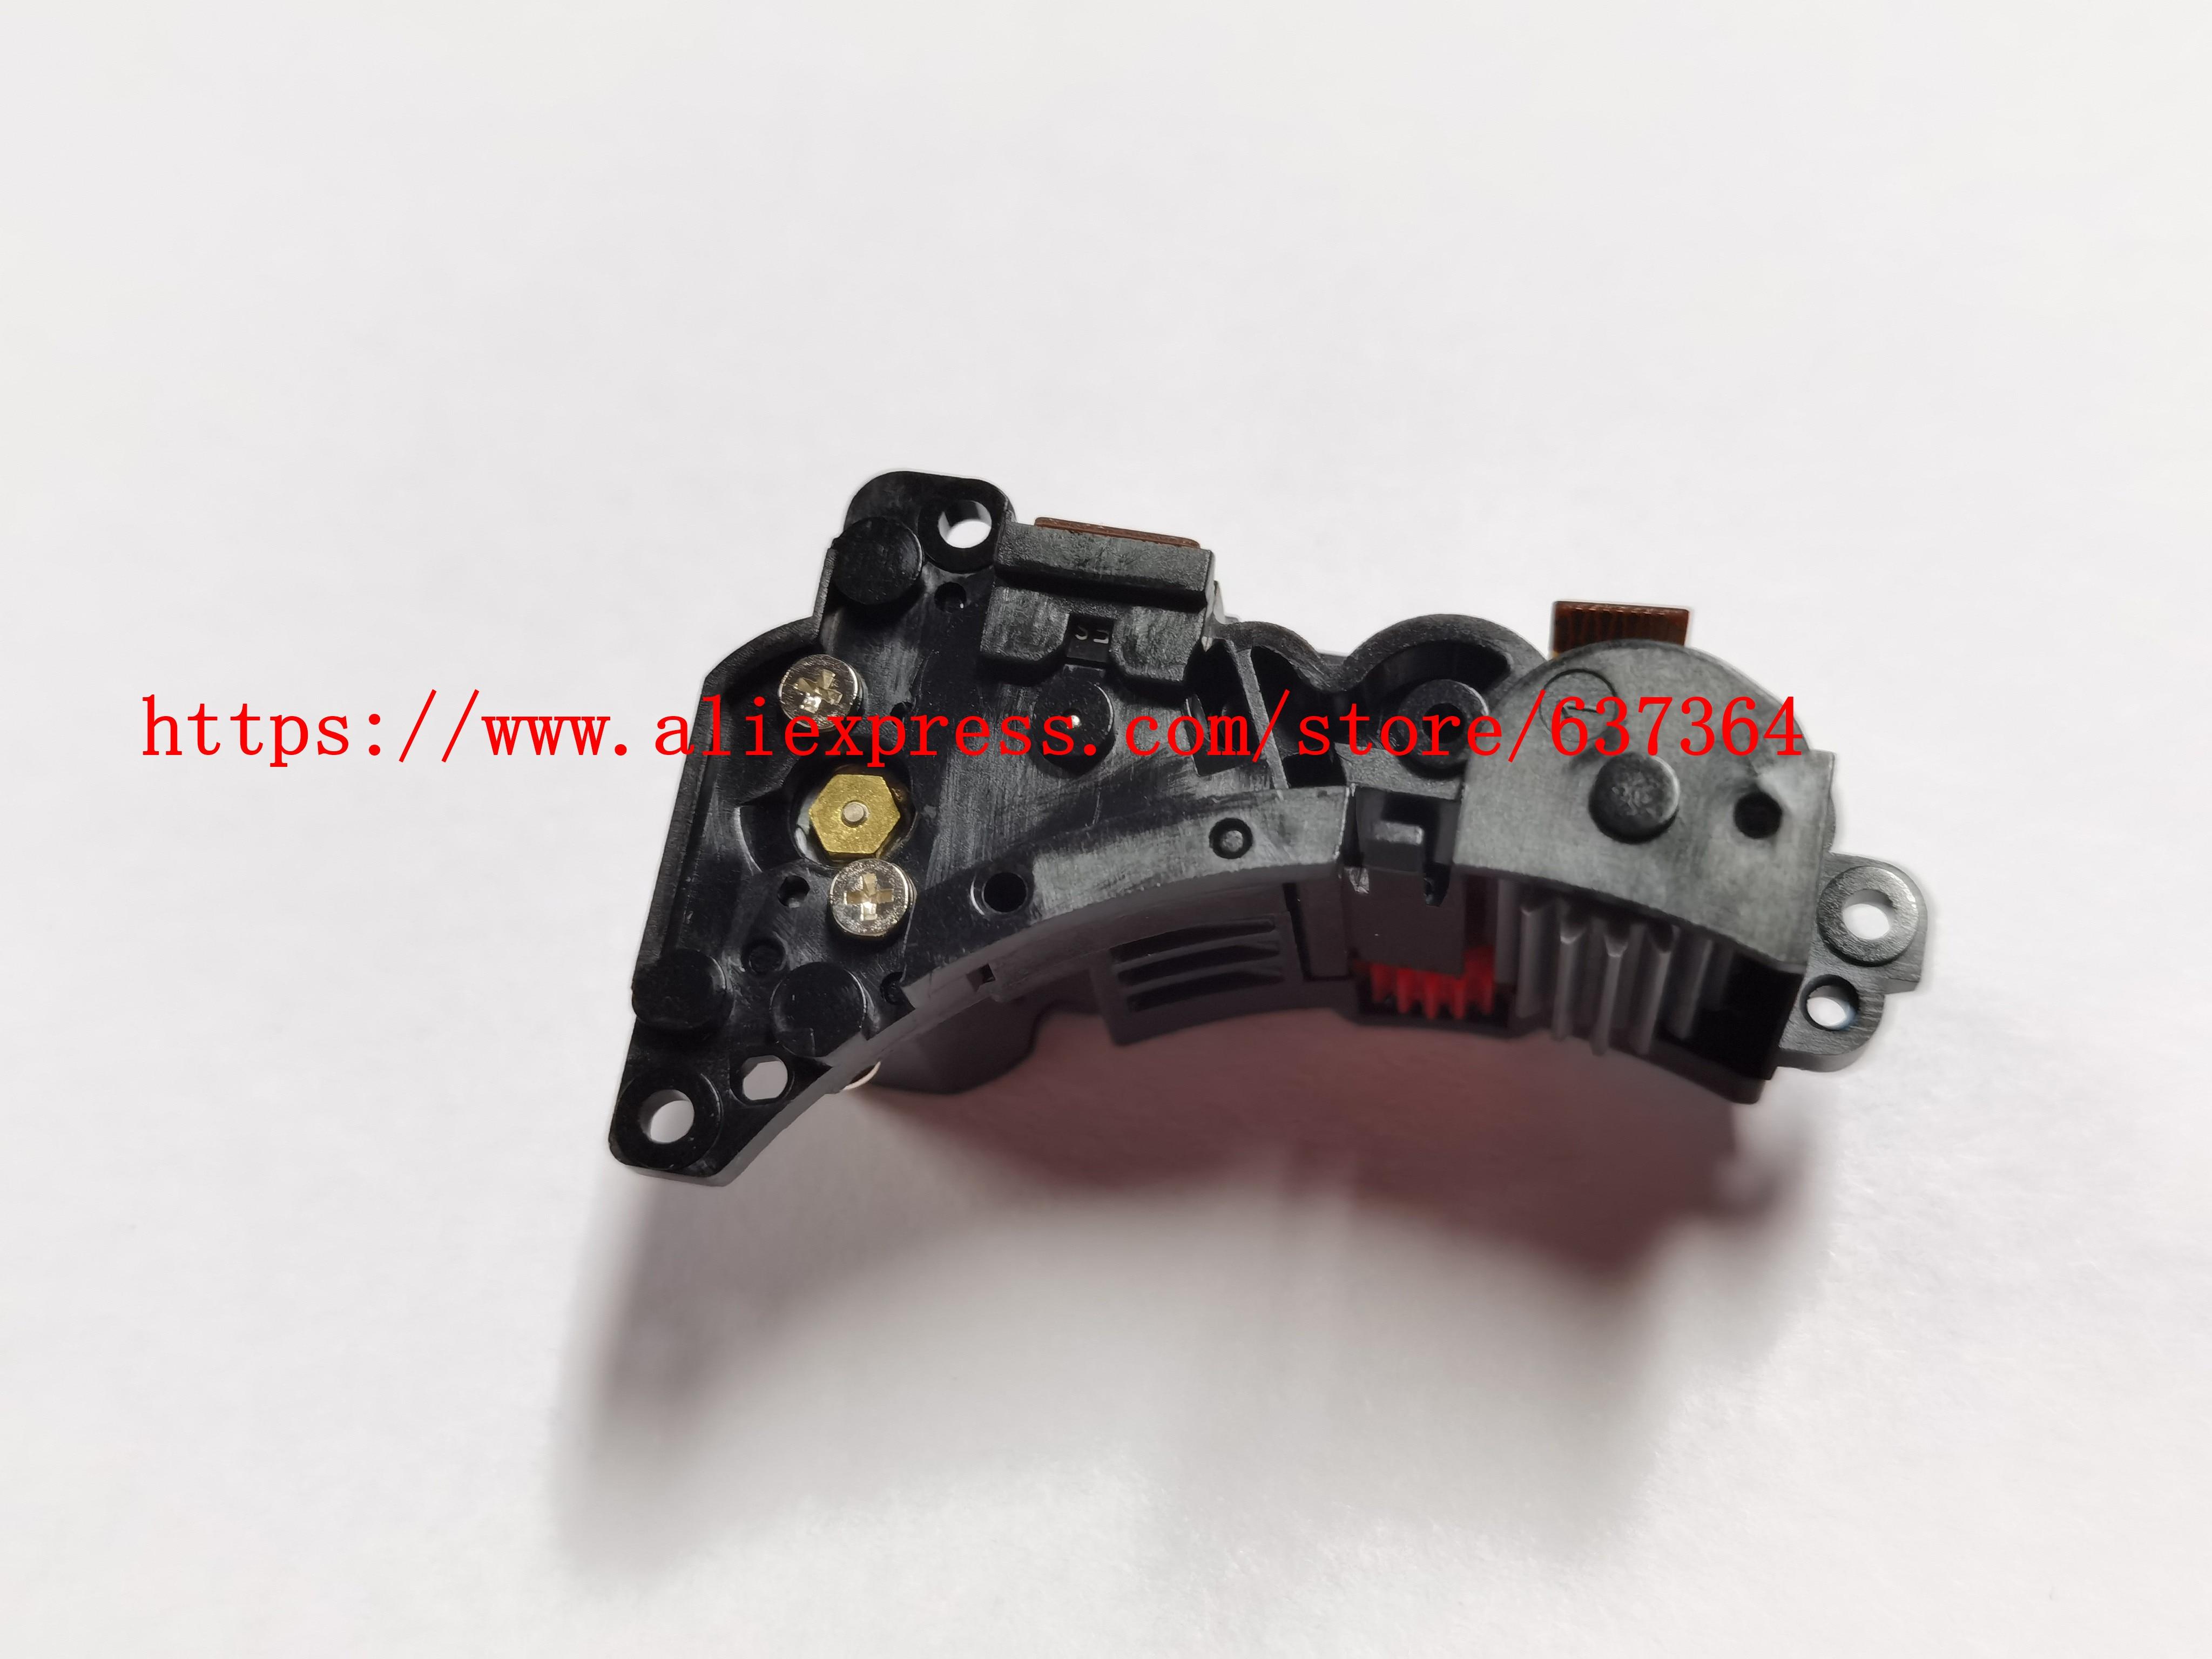 100% nuevo motor de lente SX60 original usado para Canon sx60 controlador de motor reflectorslr Reparación de cámara parte envío gratis